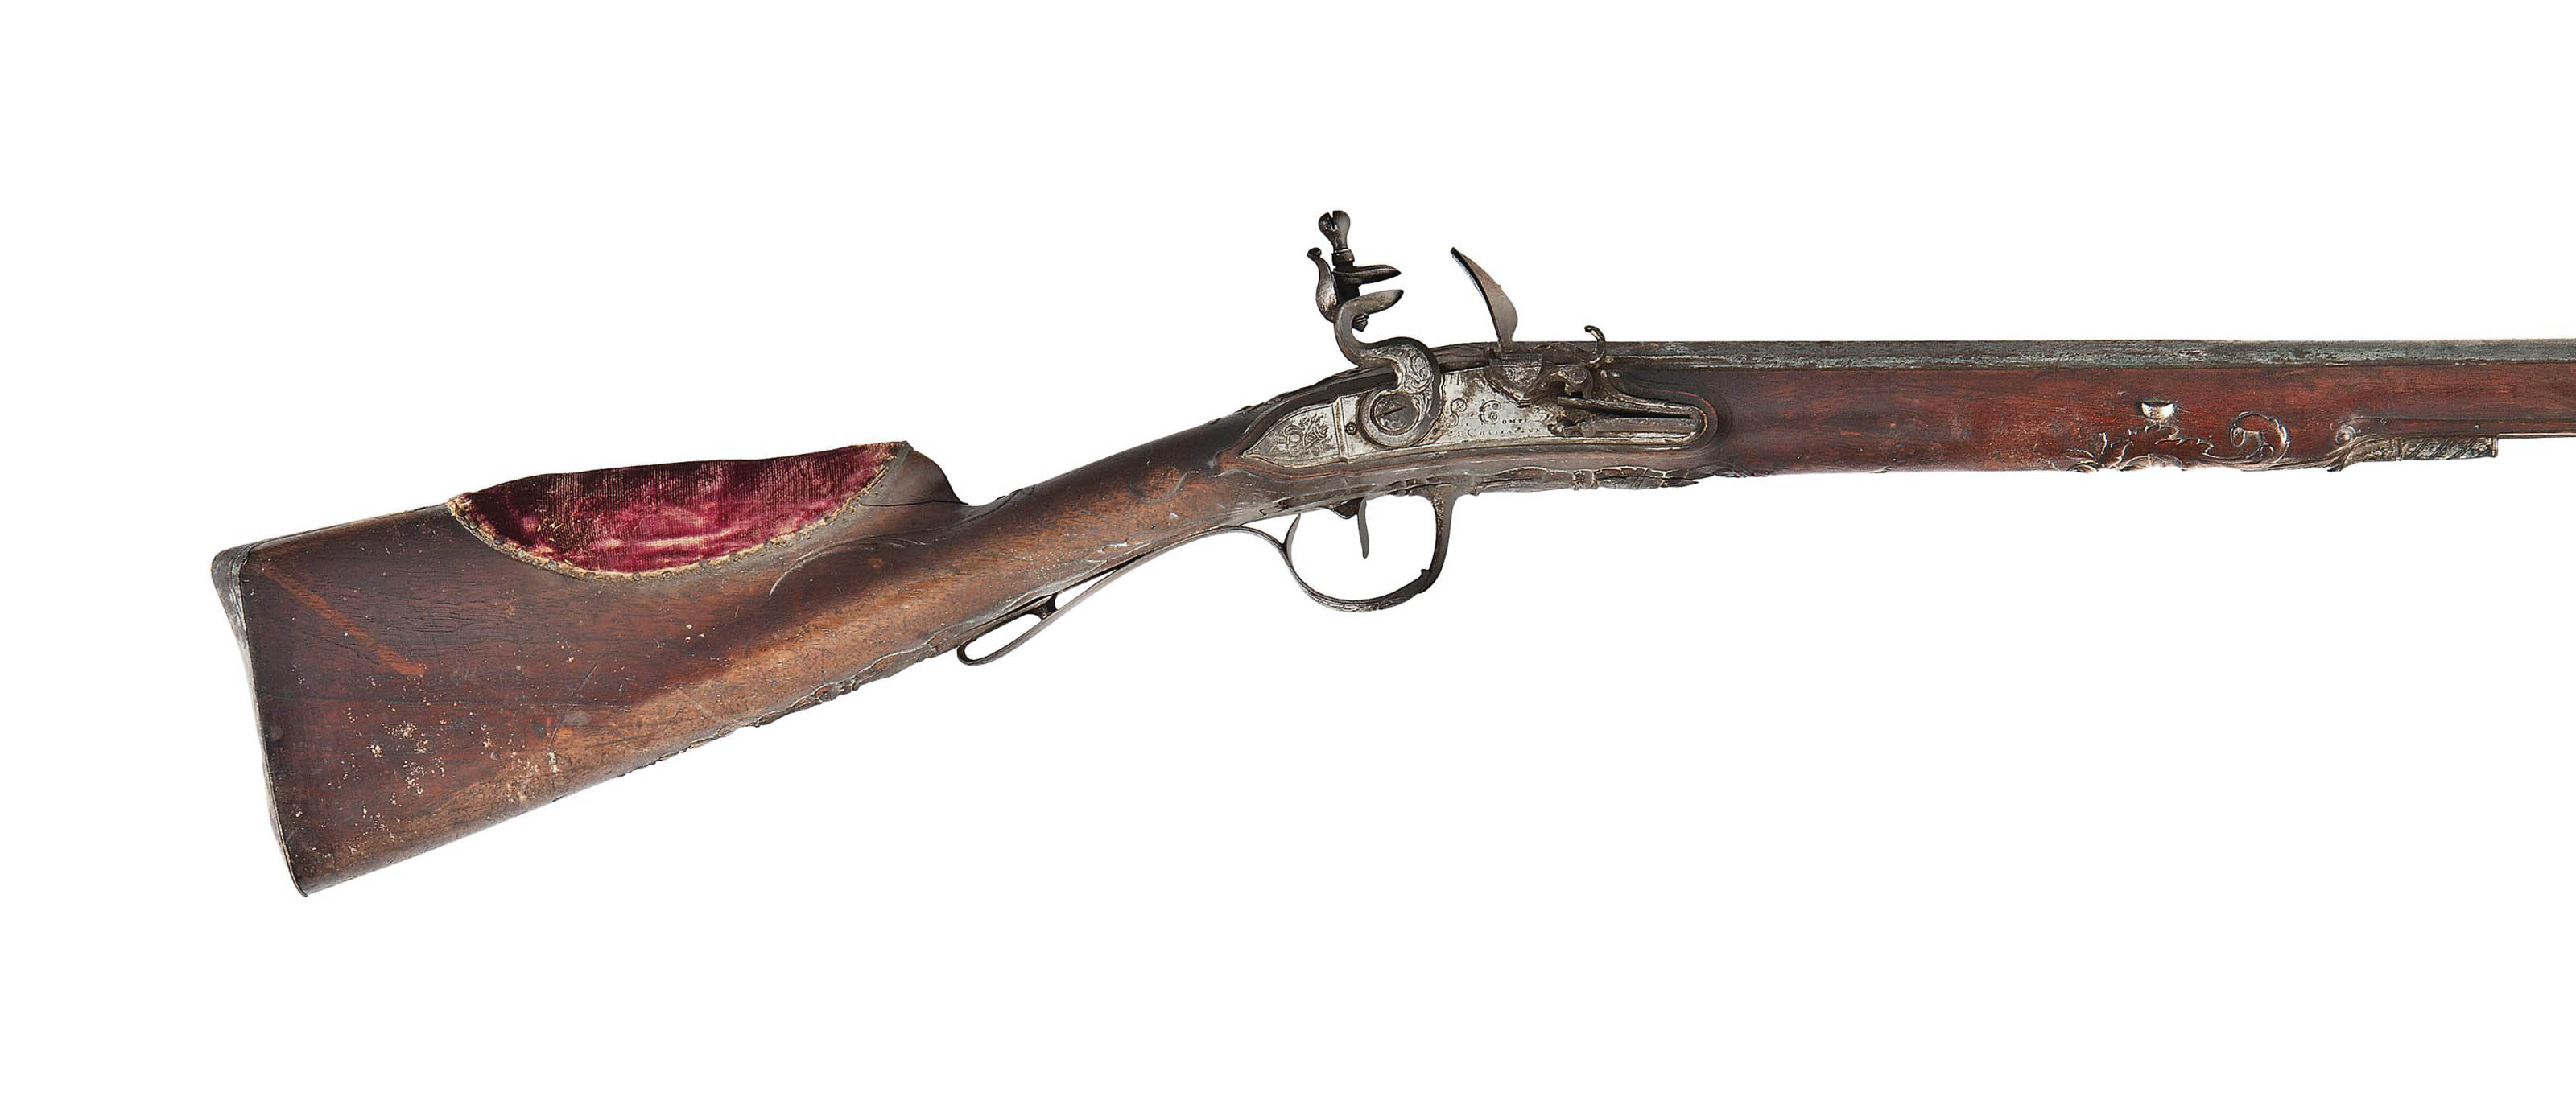 A FRENCH 20-BORE FLINTLOCK SPORTING GUN